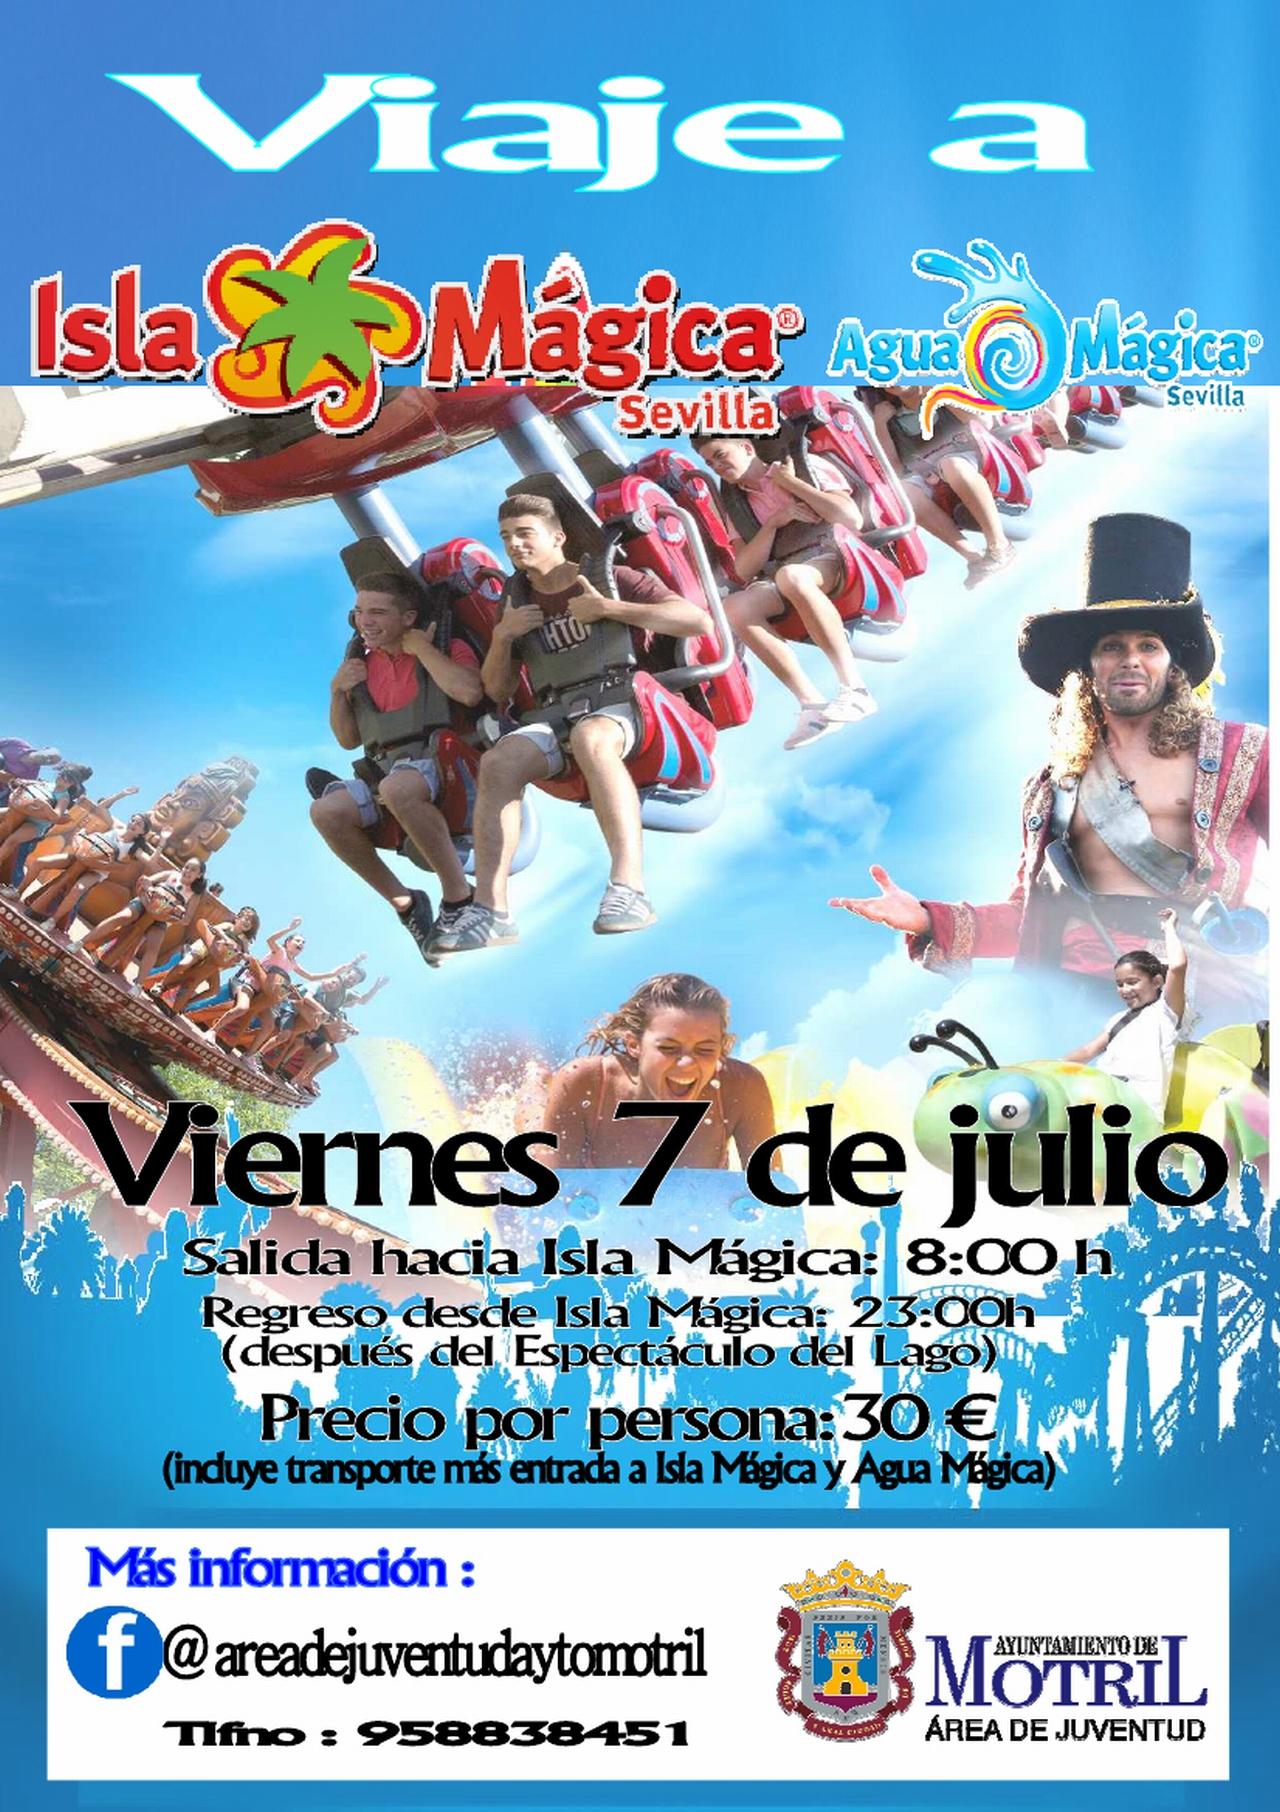 Viaje a isla m gica sevilla - Isla magica ofertas 2017 ...